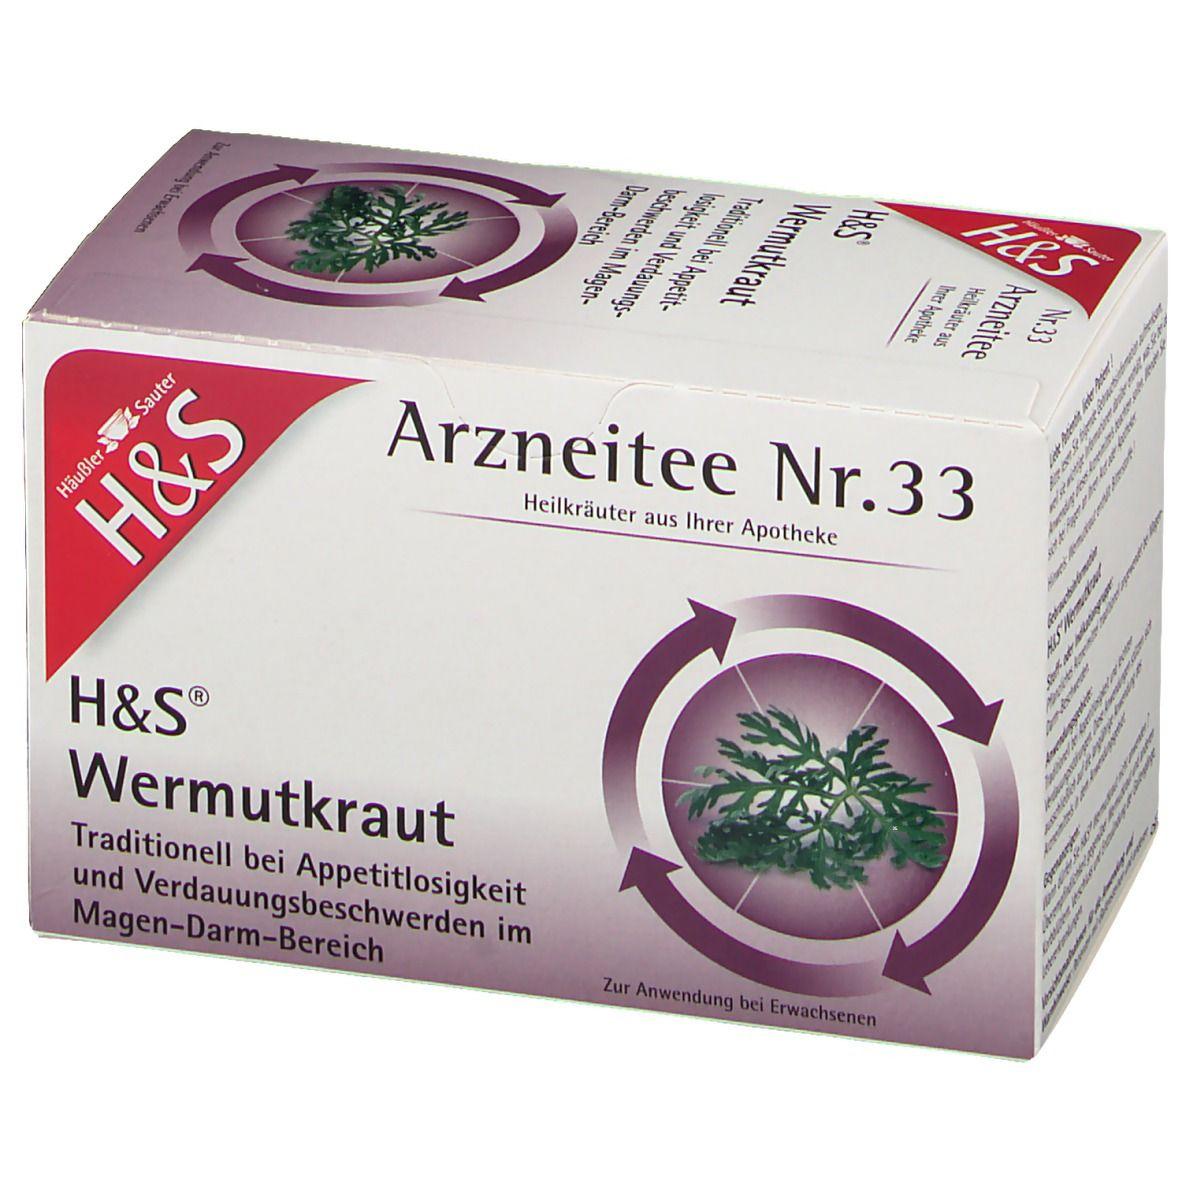 H&S Wermutkraut Nr. 33